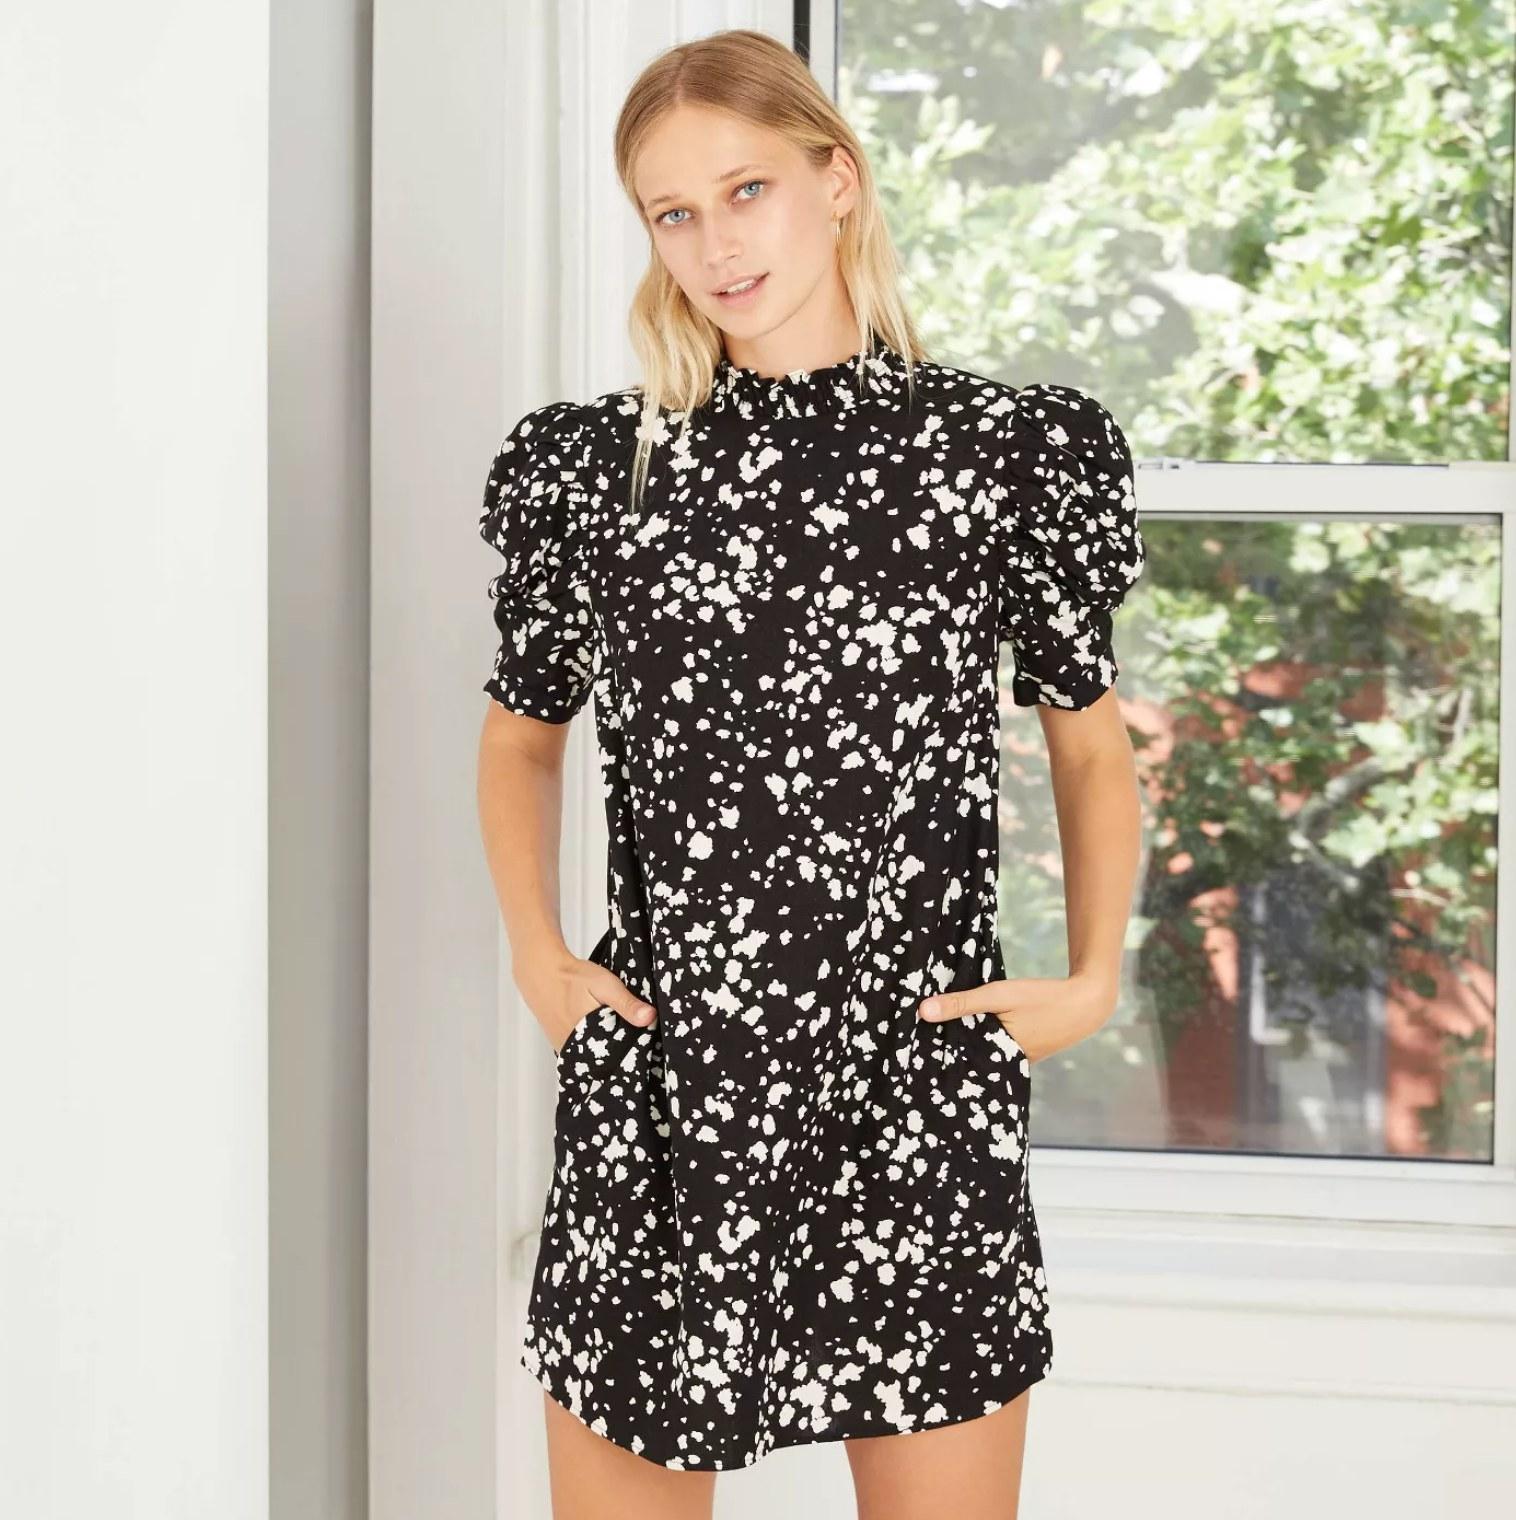 Model wearing the dress in black with white splatter pattern